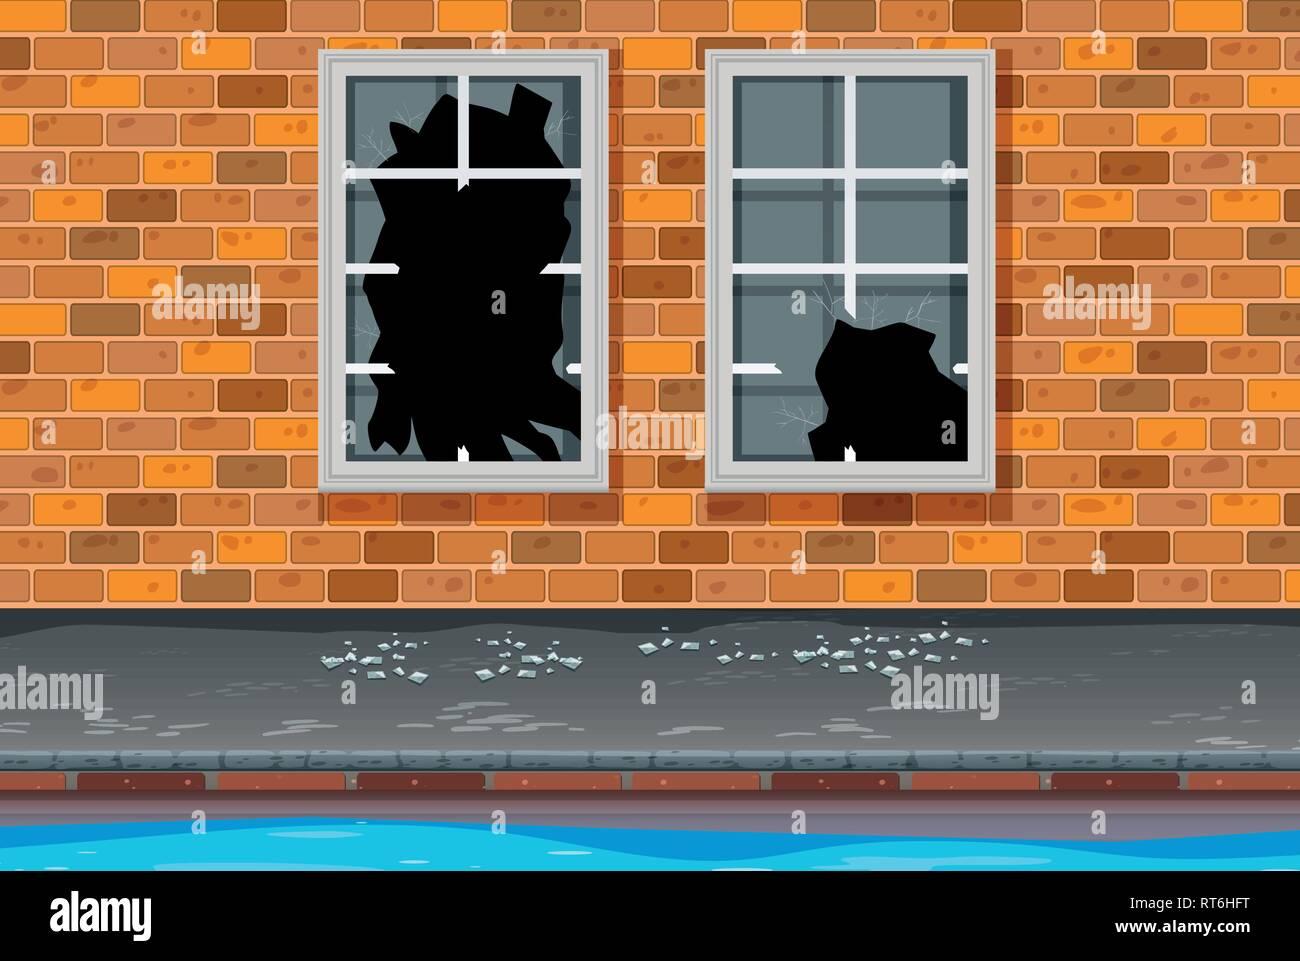 Unsafe urban neighborhoods background illustration - Stock Vector